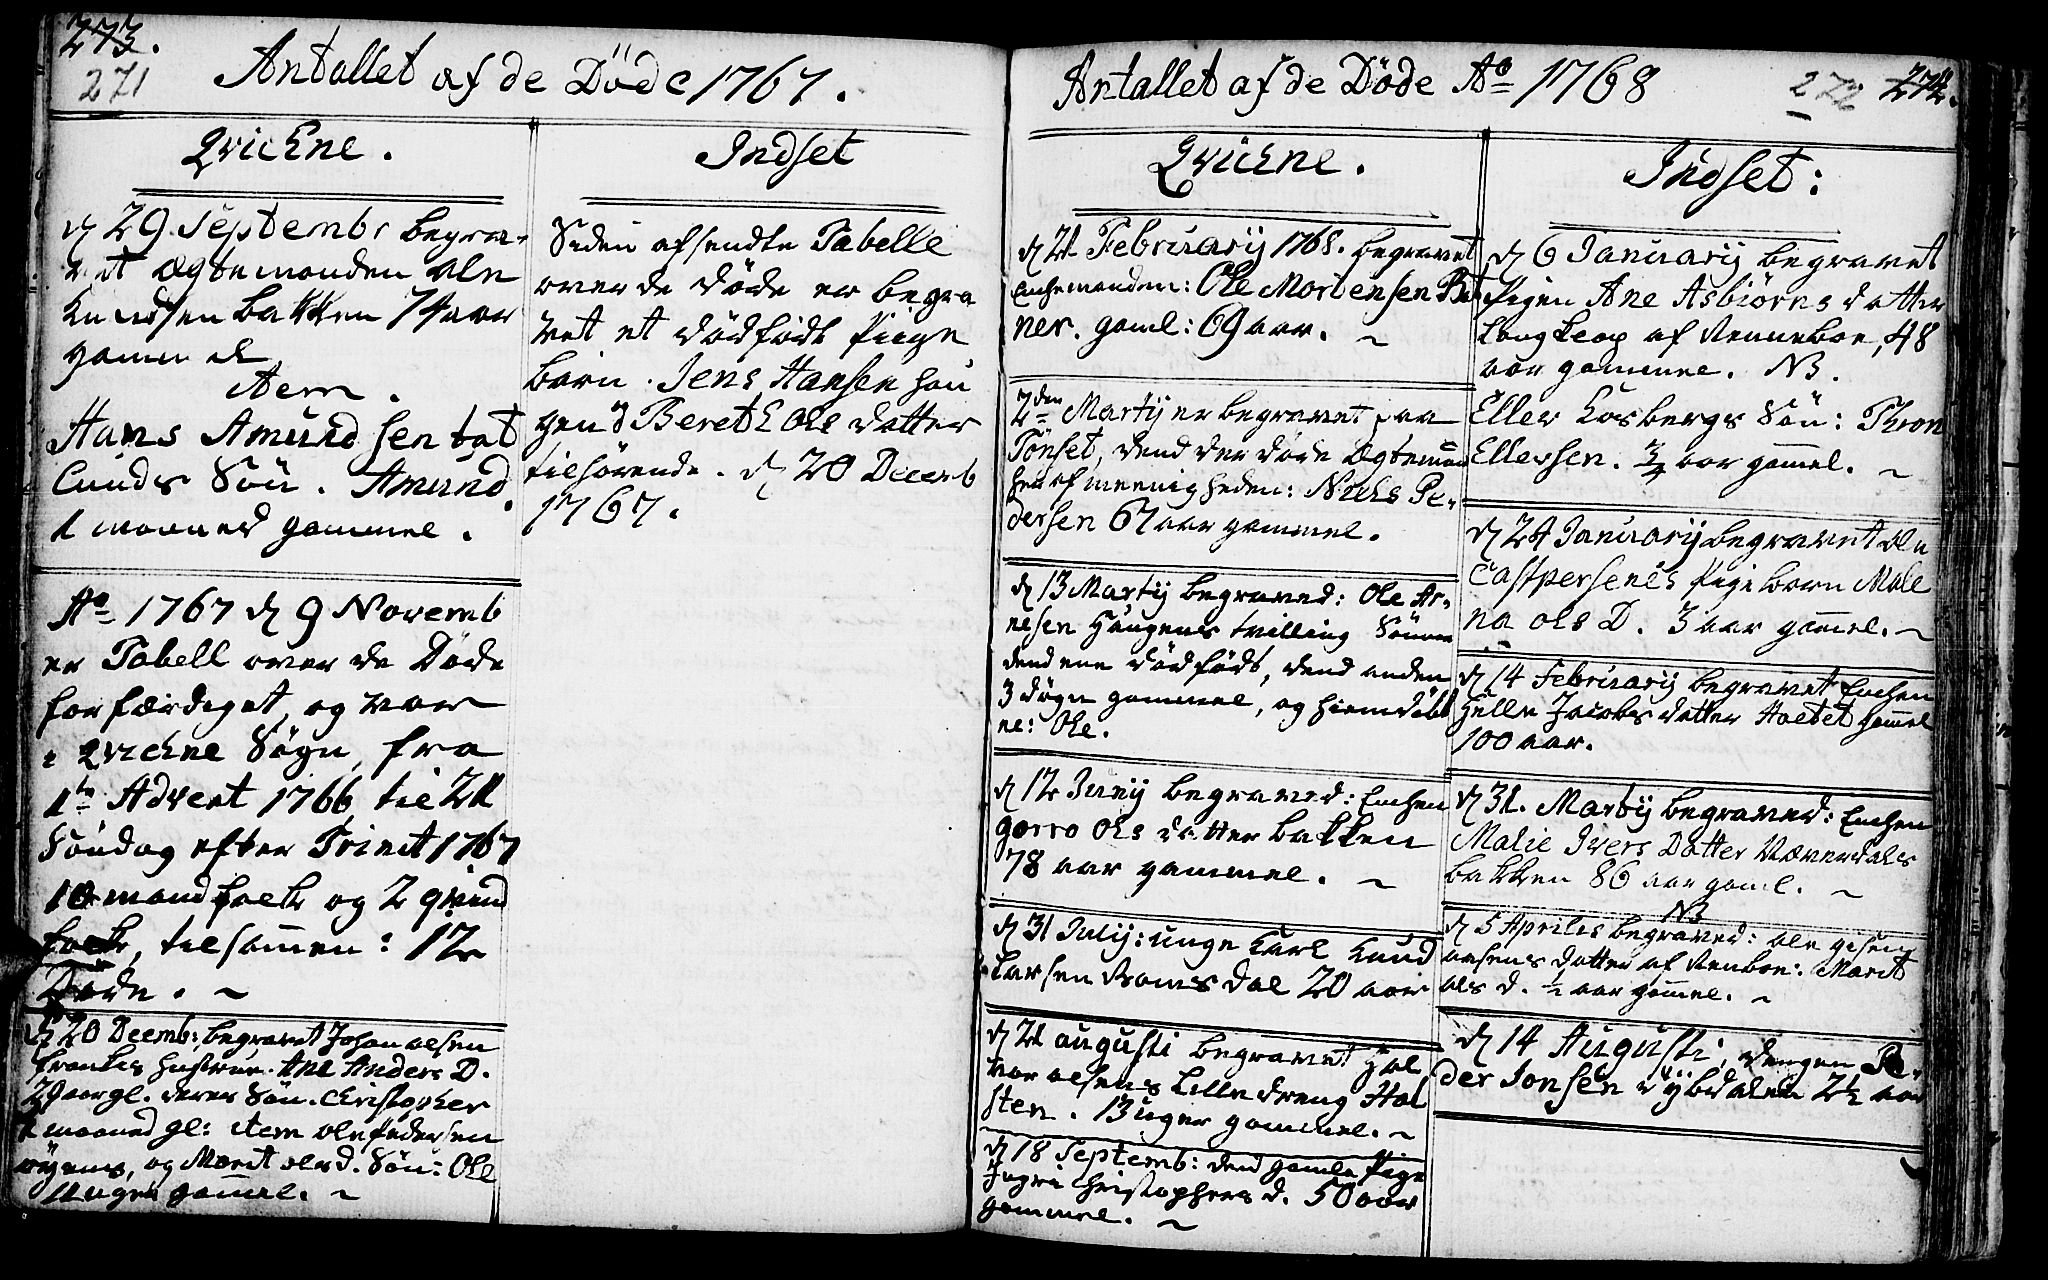 SAH, Kvikne prestekontor, Ministerialbok nr. 2, 1764-1784, s. 271-272